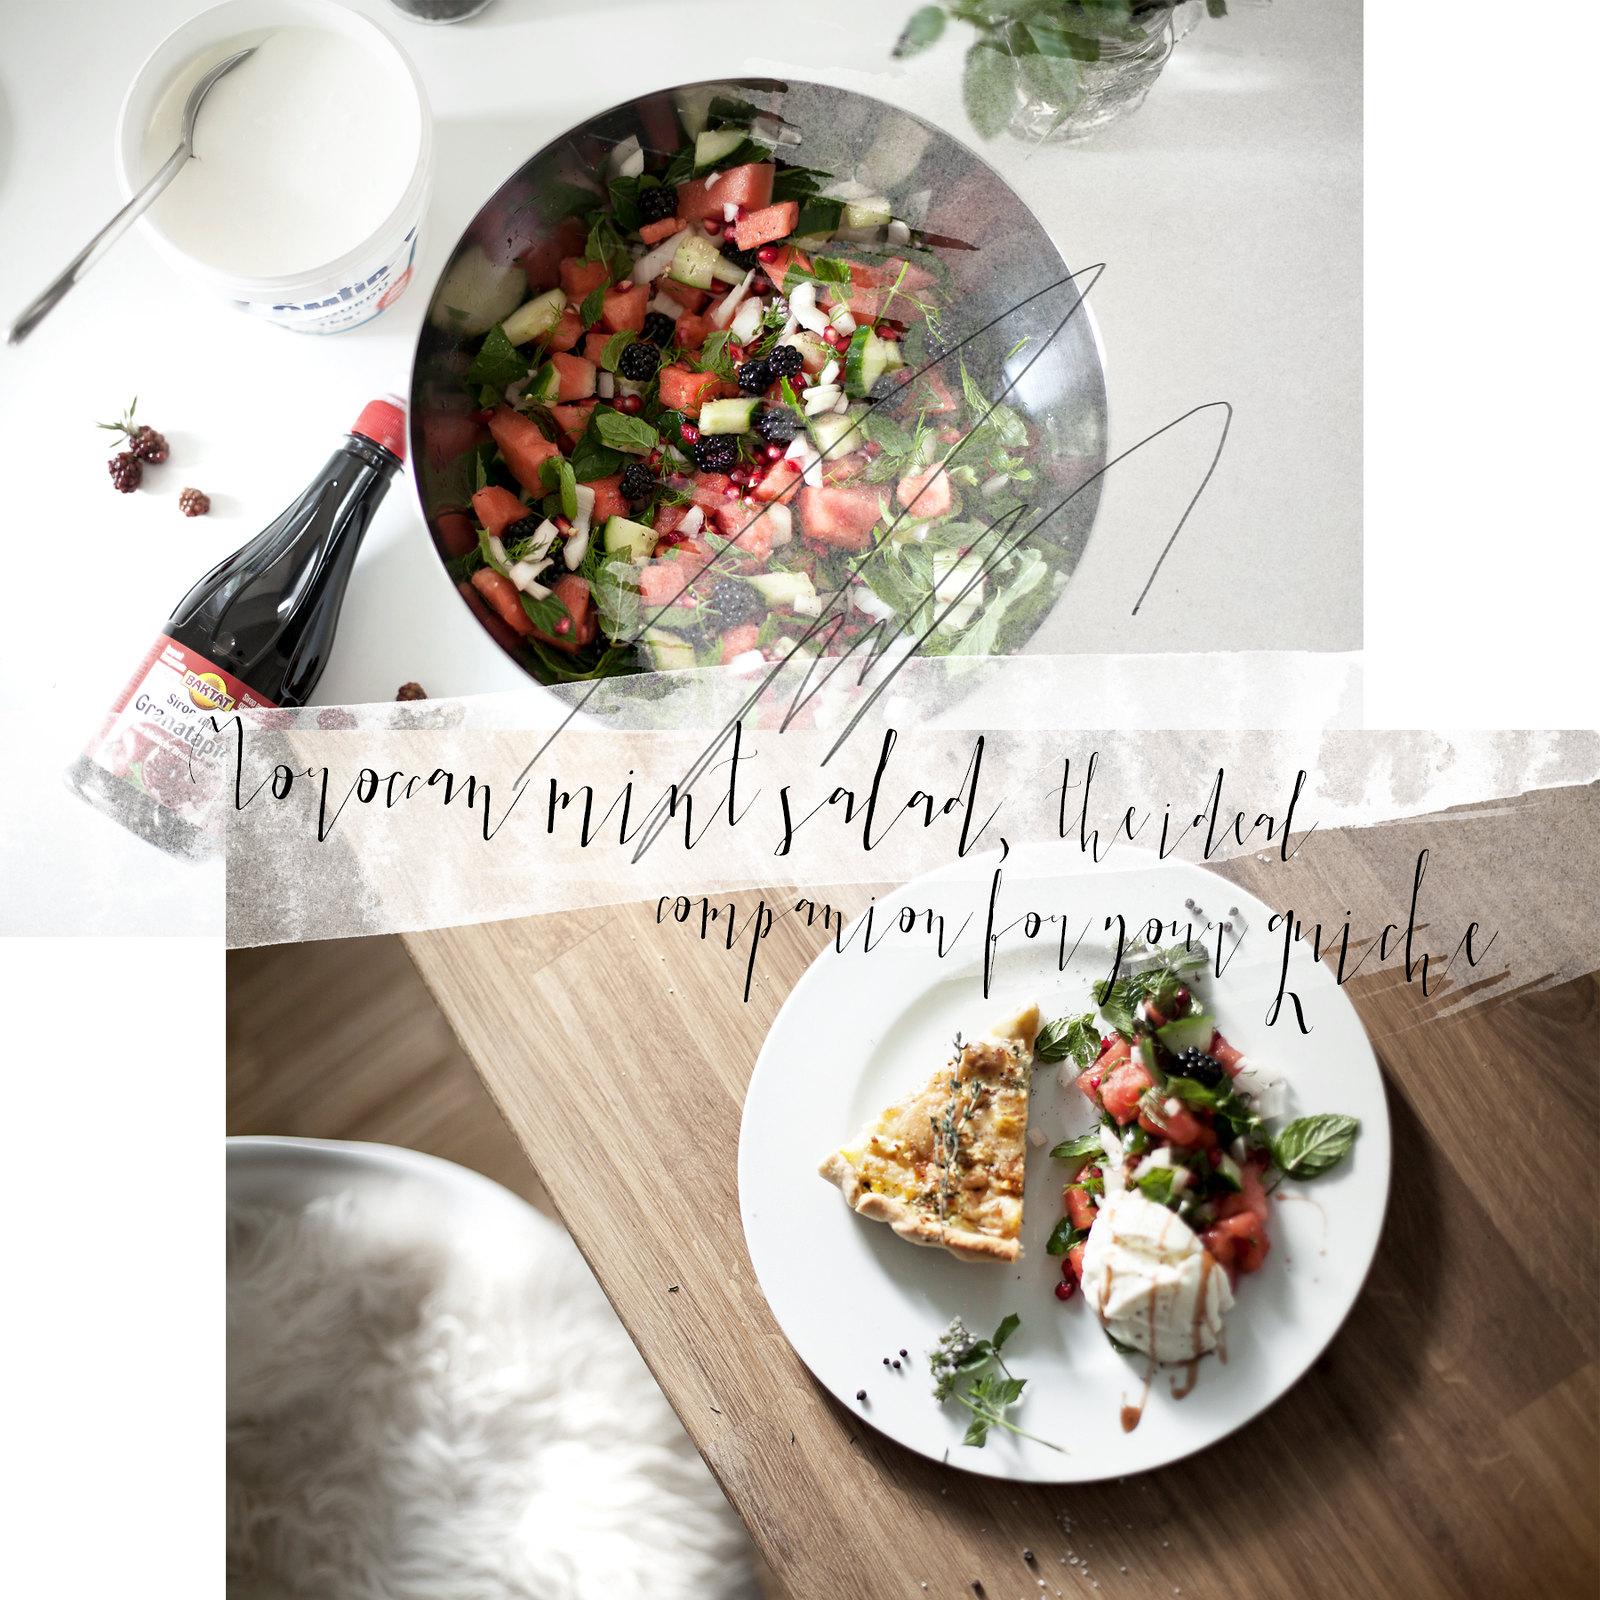 rezept kochen quiche salad cooking recipe morocco healthy fruit magazine lifestyle lifestyleblogger blogger germany berlin dusseldorf cats & dogs blog fashionblogger ricarda schernus 2